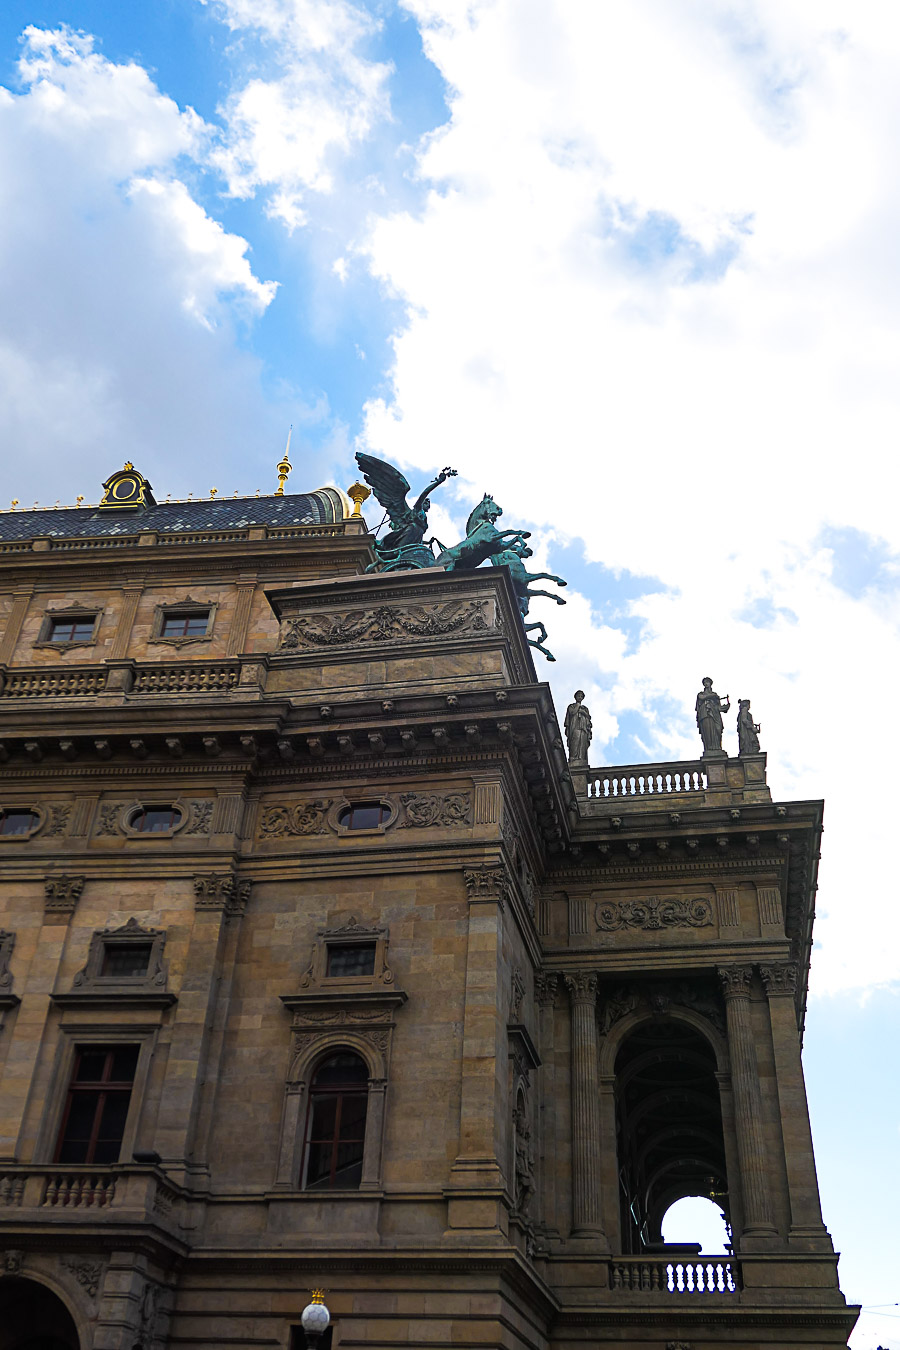 Prague Architecture Photos - National Theatre